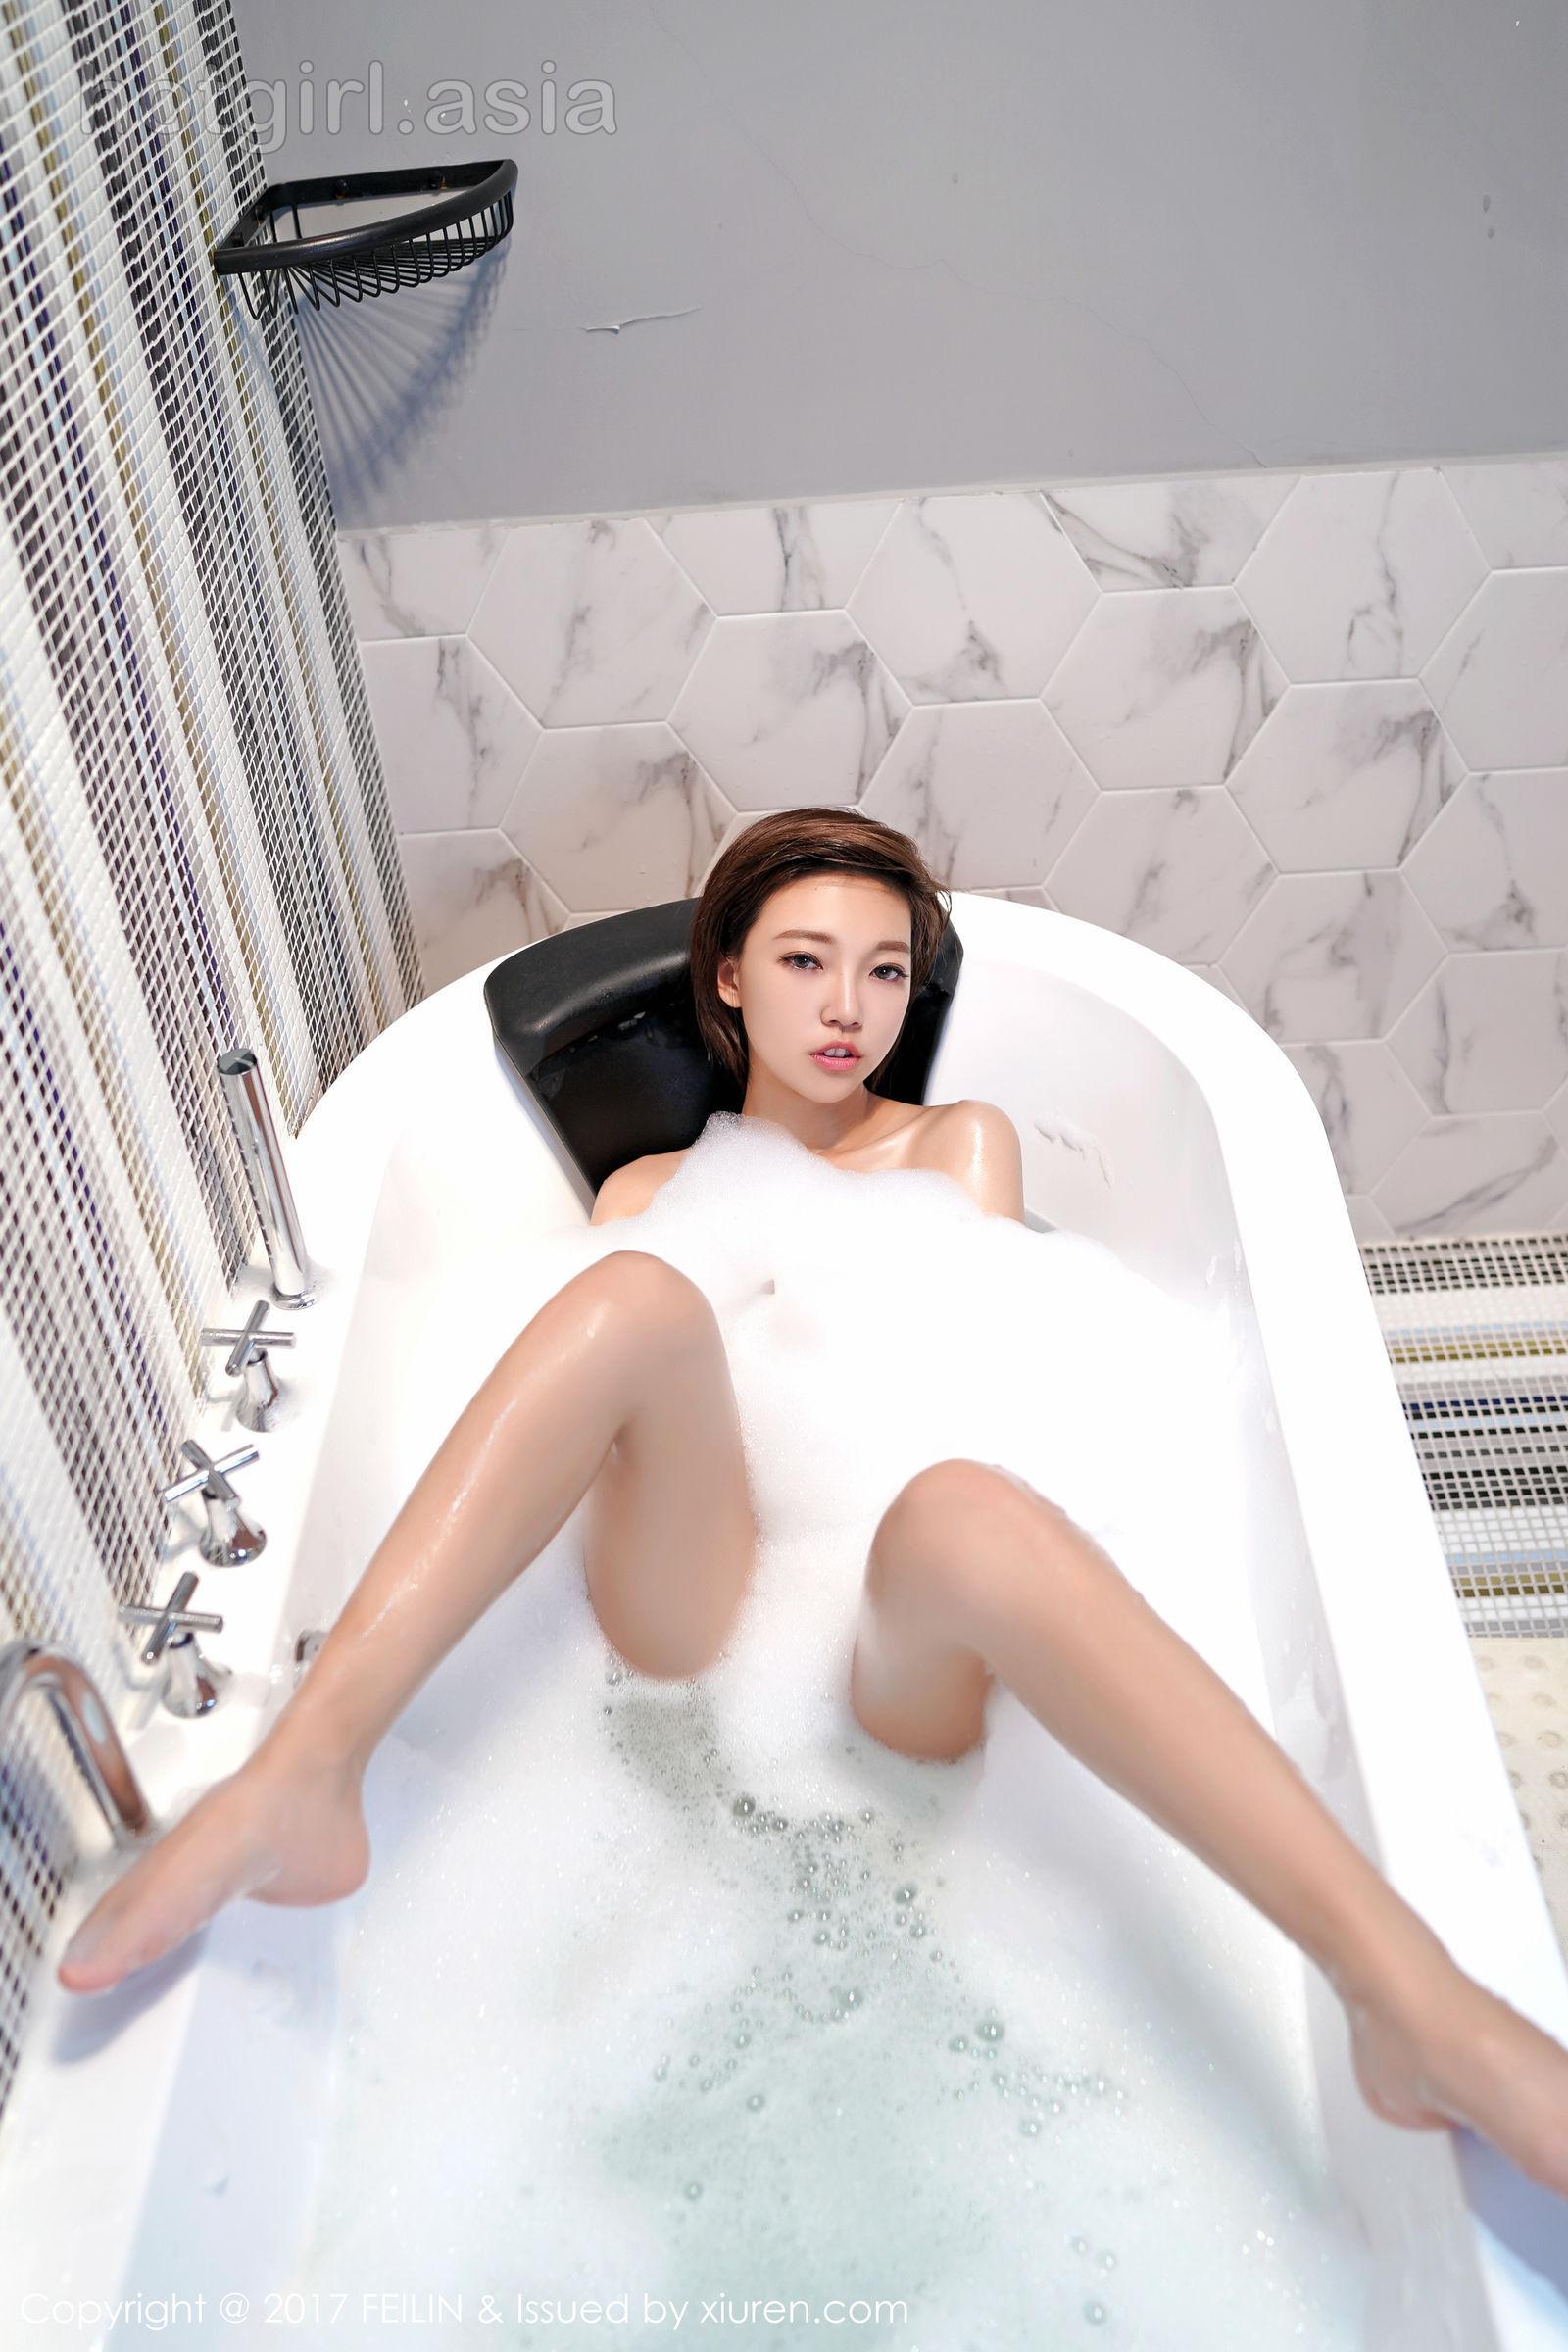 [FEILIN 囲 囡囡] Vol.118 Short Hair Girl @ 冯 木木 LRIS latest sexy photo